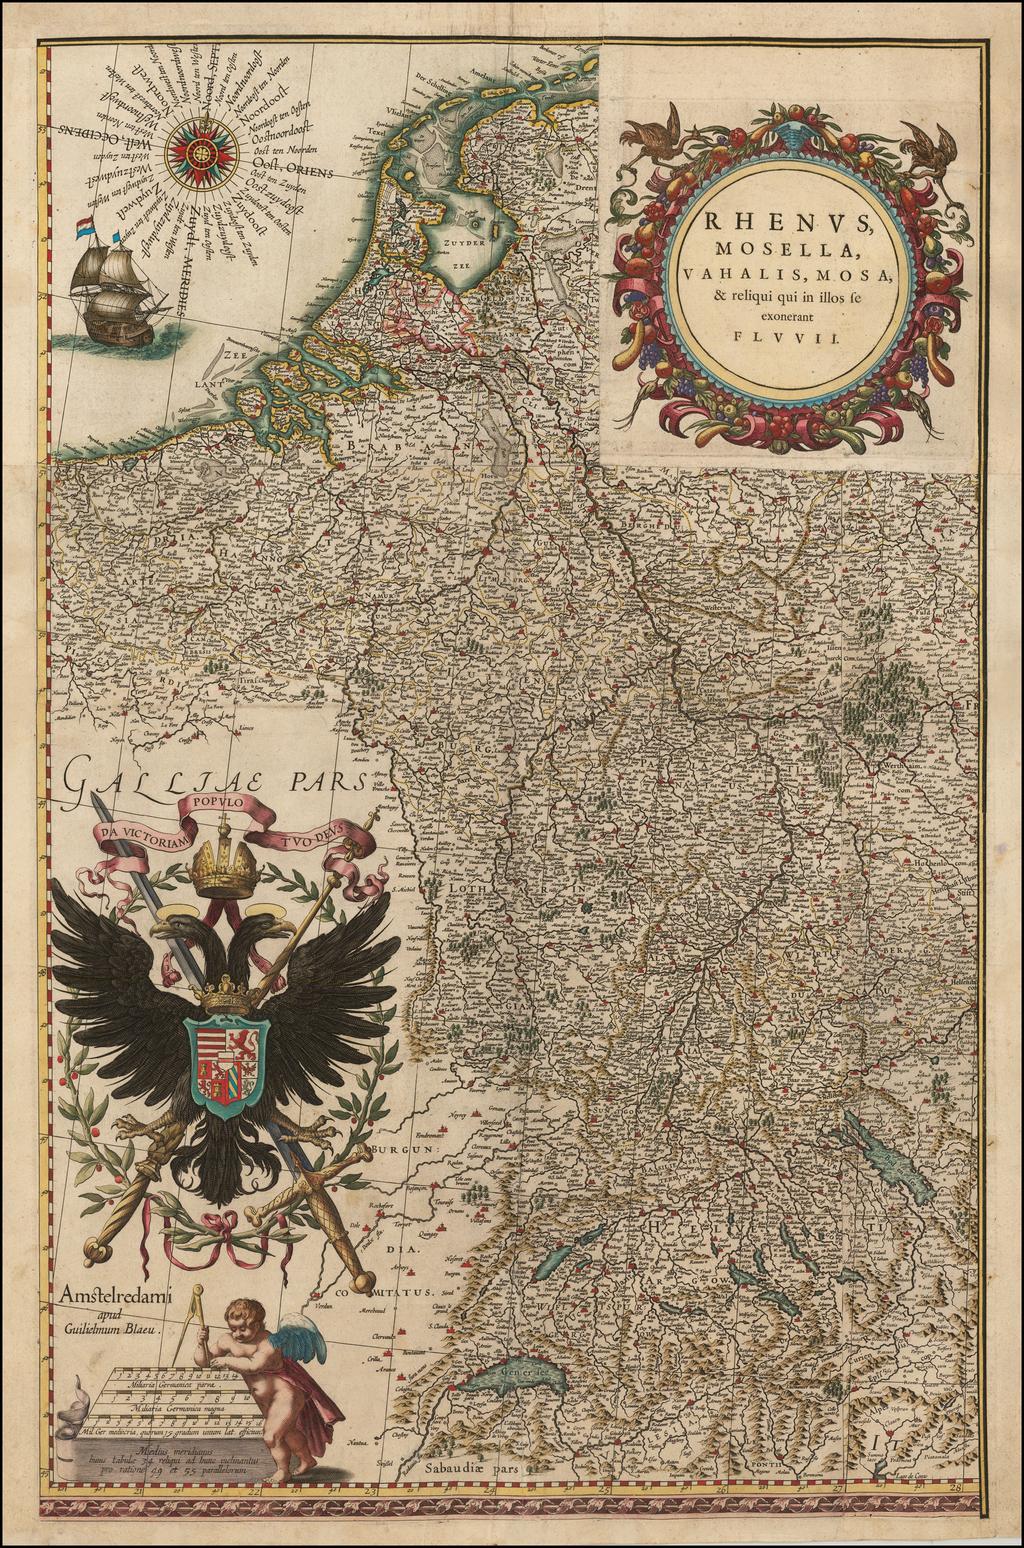 Rhenus, Mosella, Vahalis, Mosa & reliqui qui se exonerant fluvii By Willem Janszoon Blaeu